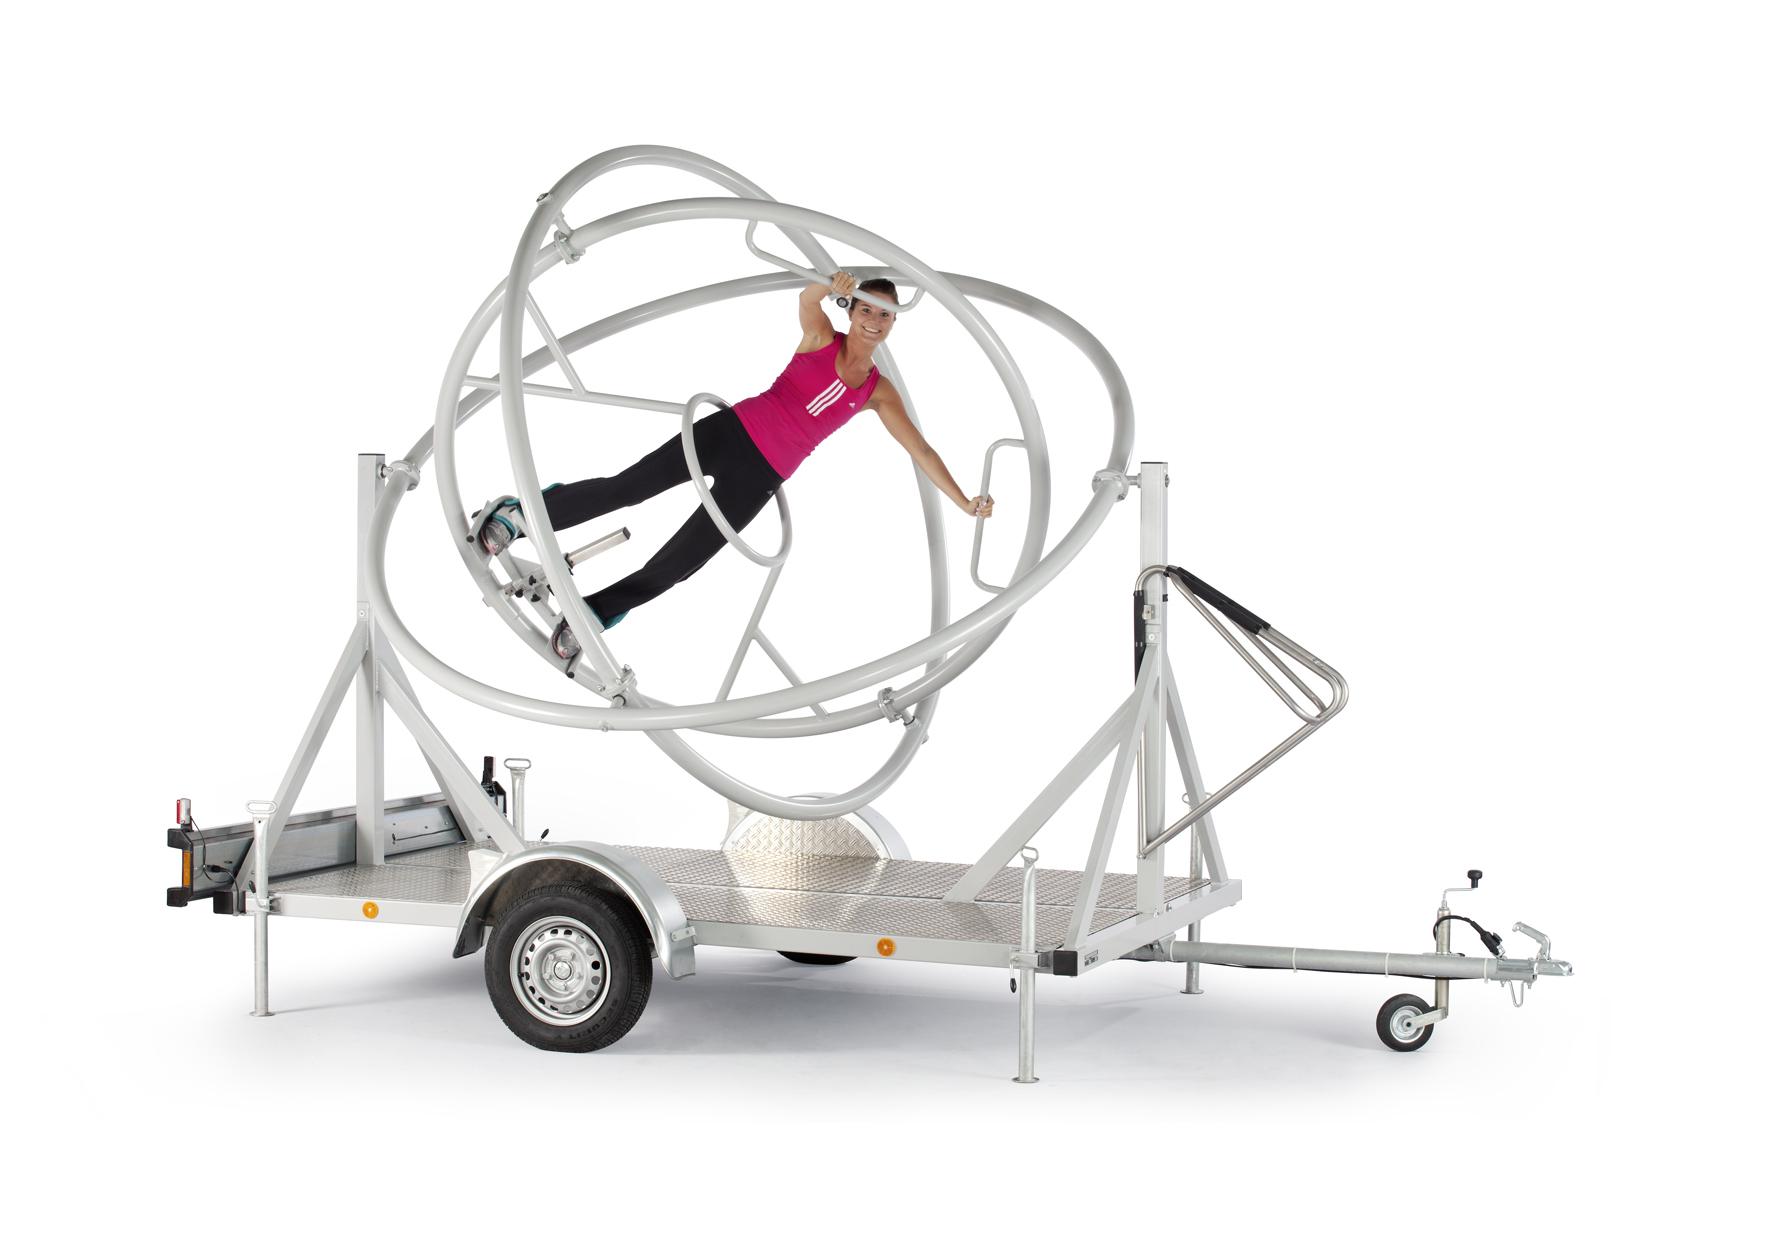 Aerotrim Fun Sport Herausforderung 3